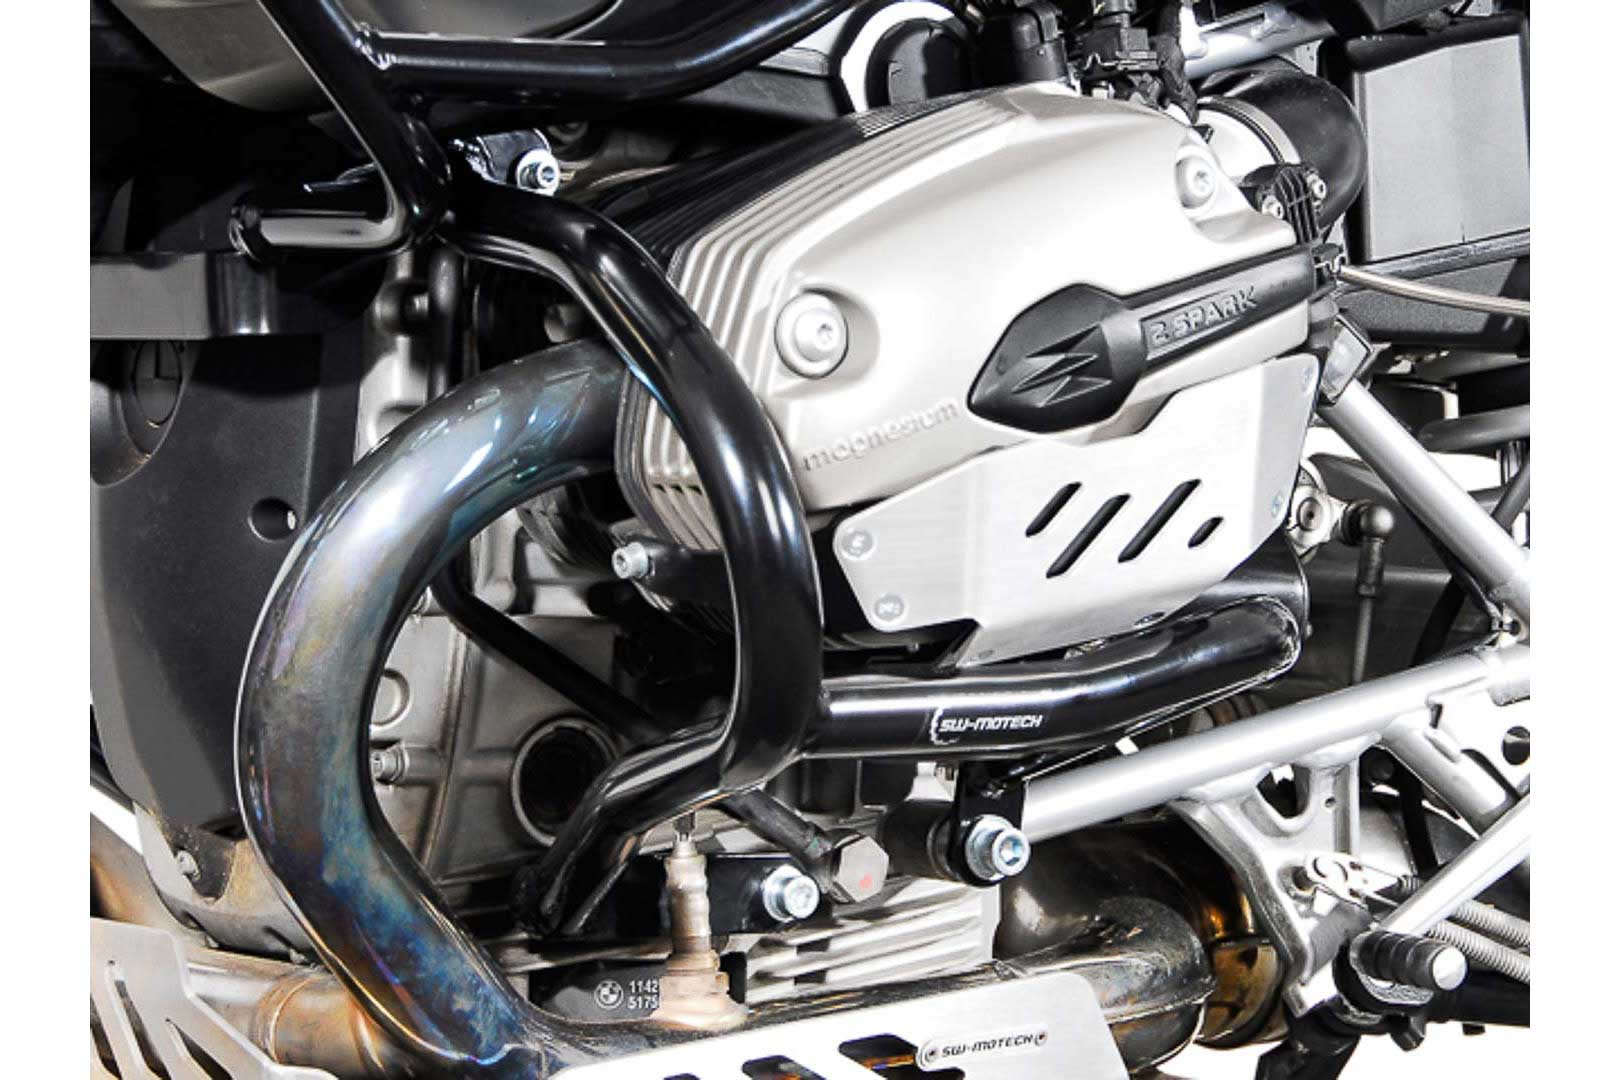 SW-Motech Moottorinsuojarauta BMW R1200GS